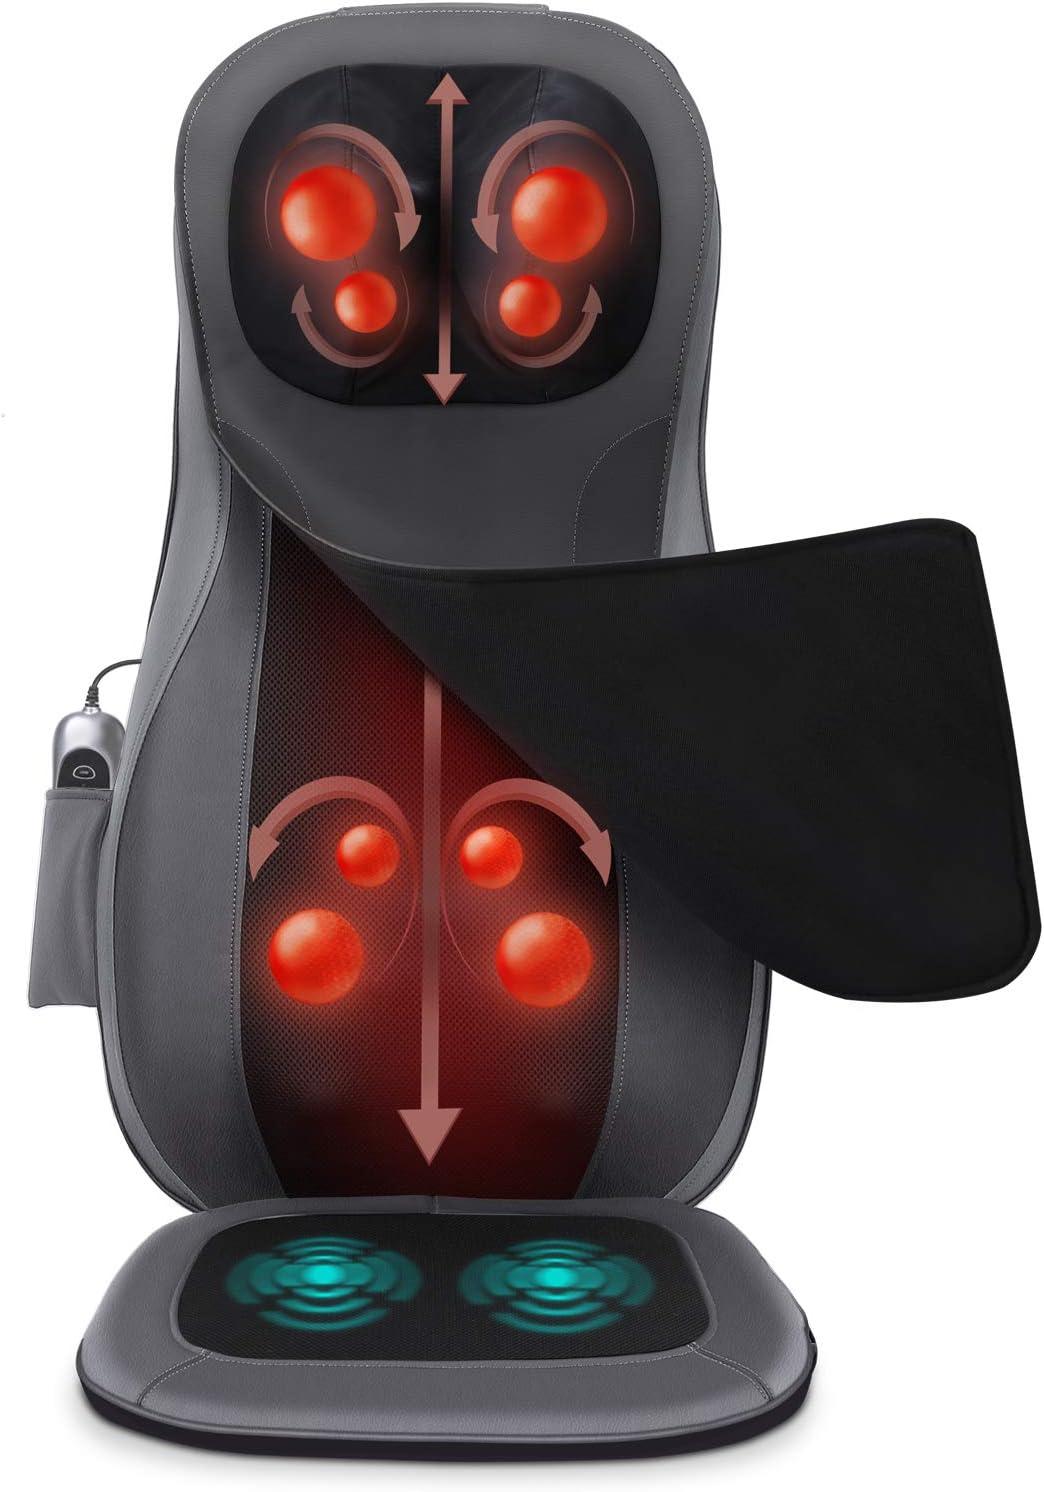 Naipo Back and Neck Massager Shiatsu Massage Chair Seat Cushion with Heat Rolling Kneading Vibration